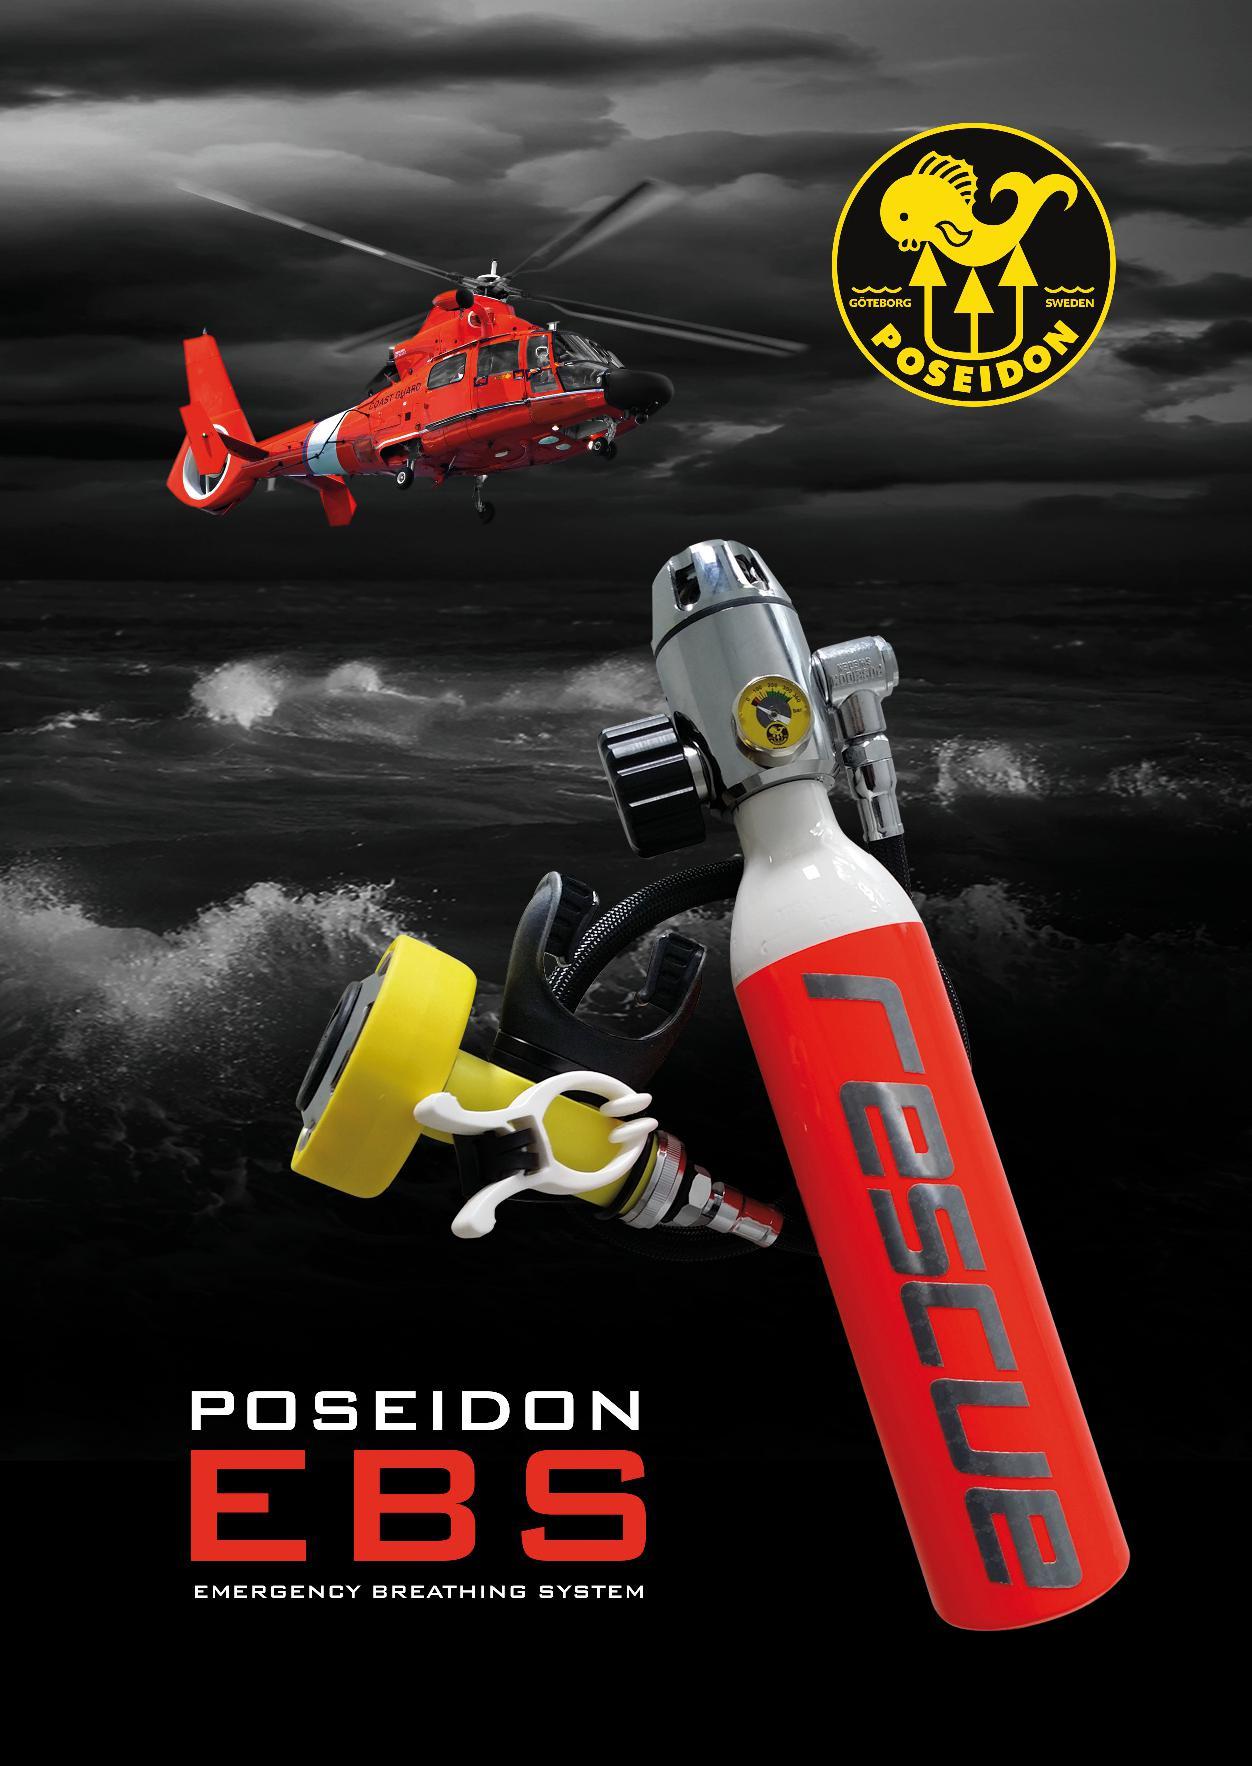 Poseidon Emergency Breathing System